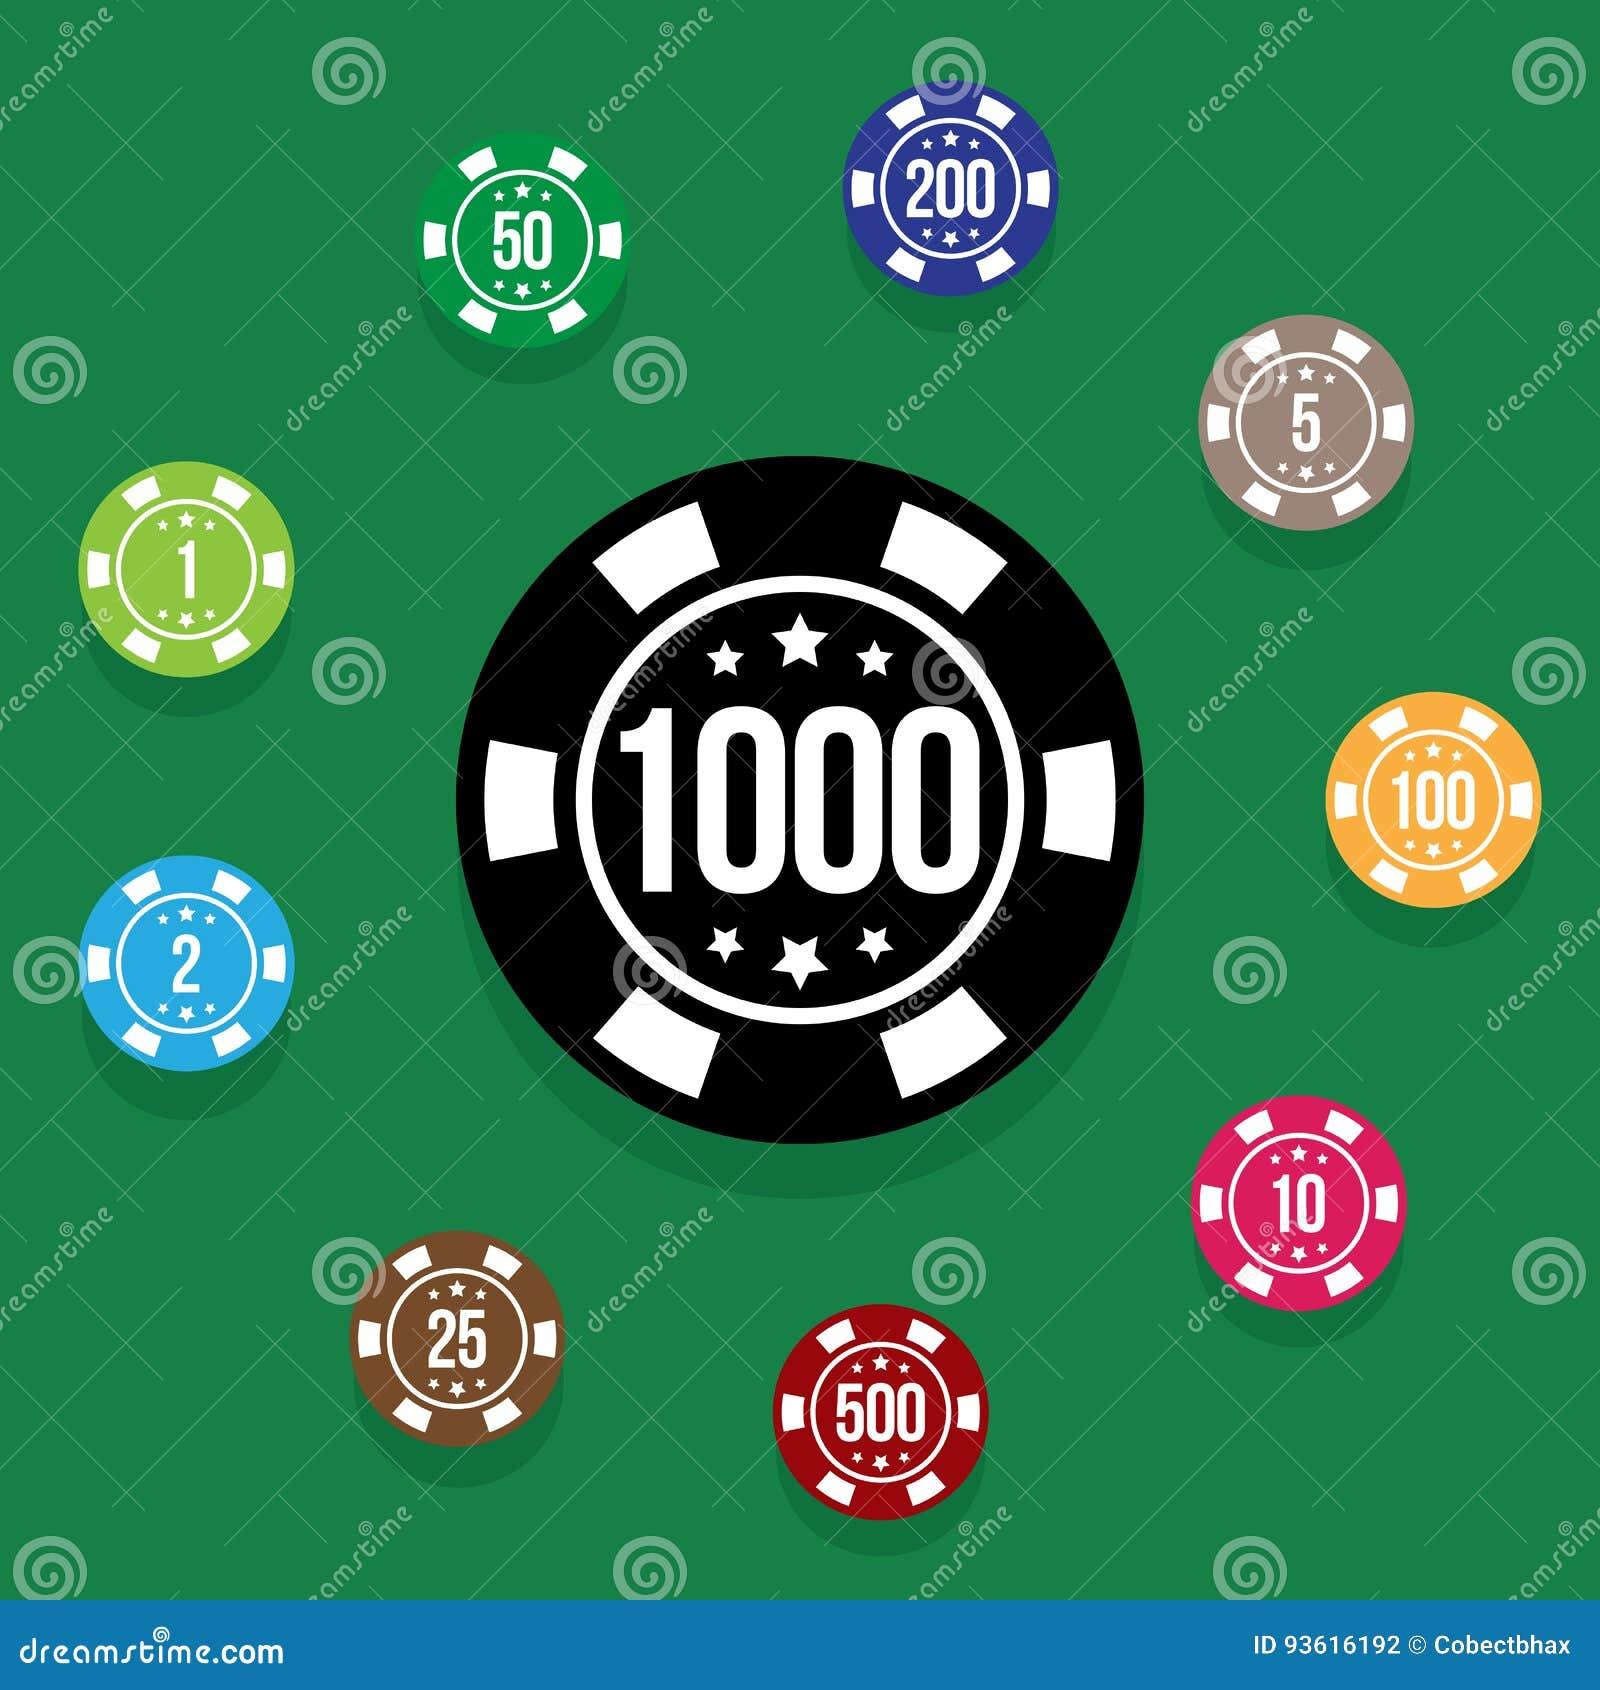 Poker table background - Set Poker Chips On Poker Table Green Color Vector Illustration Stock Vector